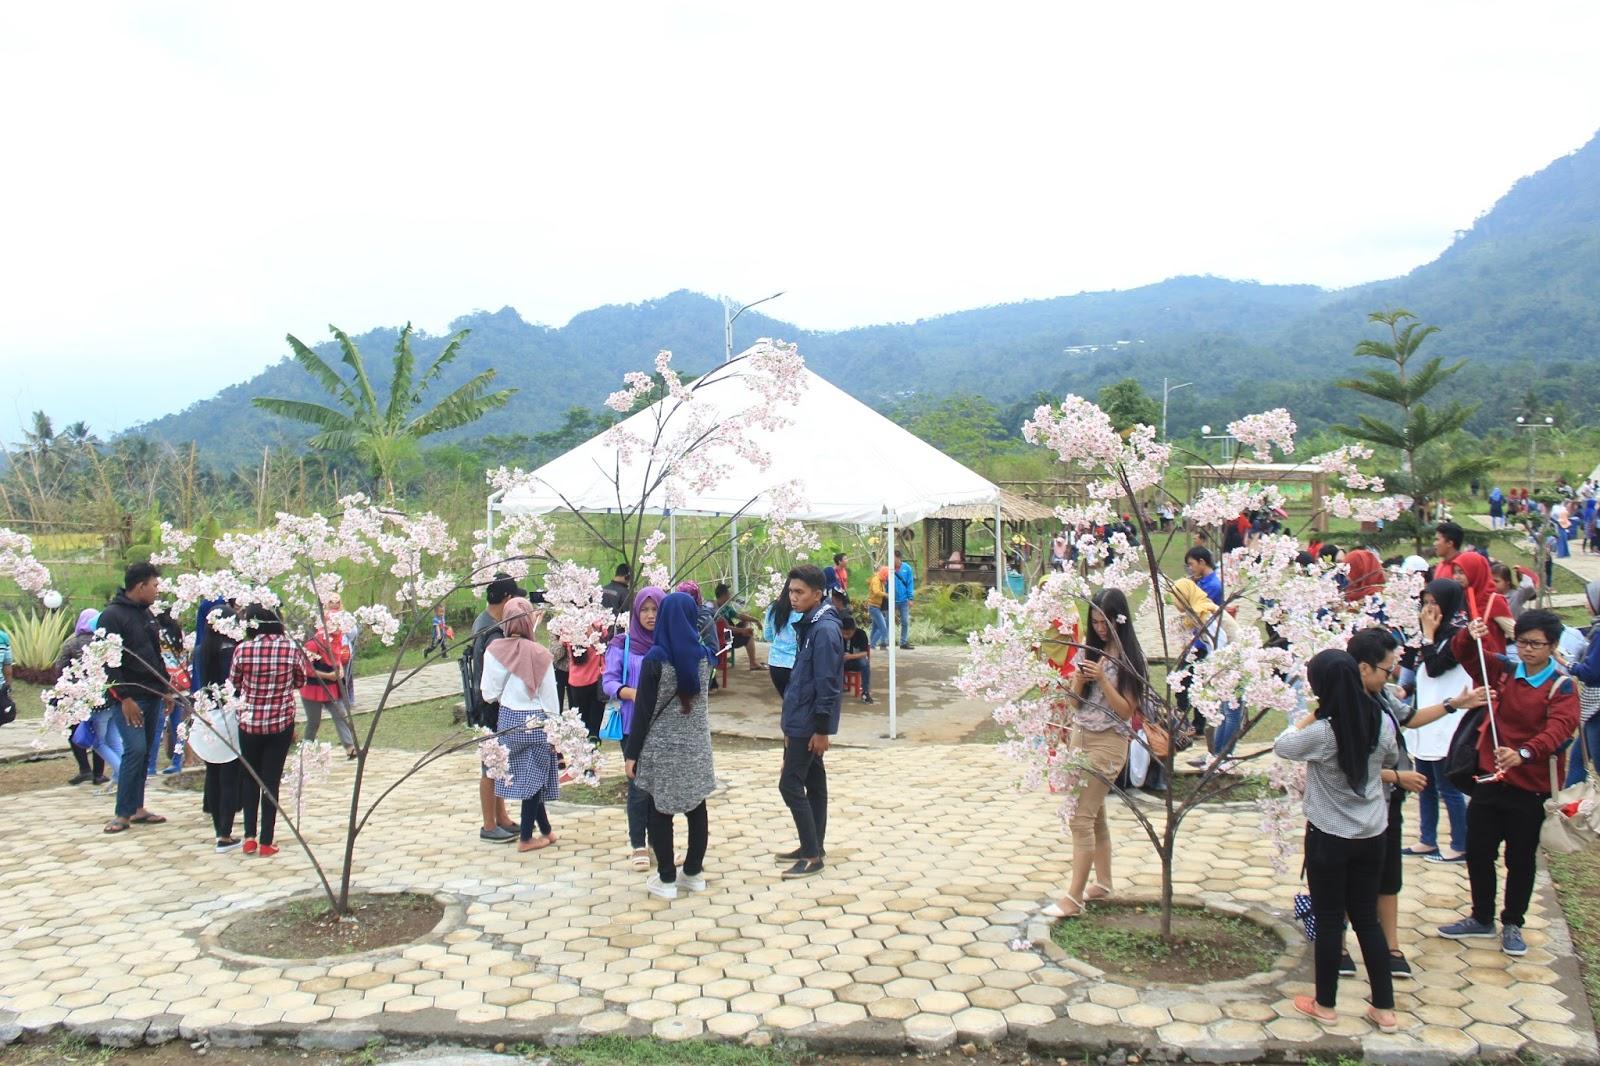 Taman Miniatur Dunia Small World Desa Ketenger Baturaden Masuk Kalian